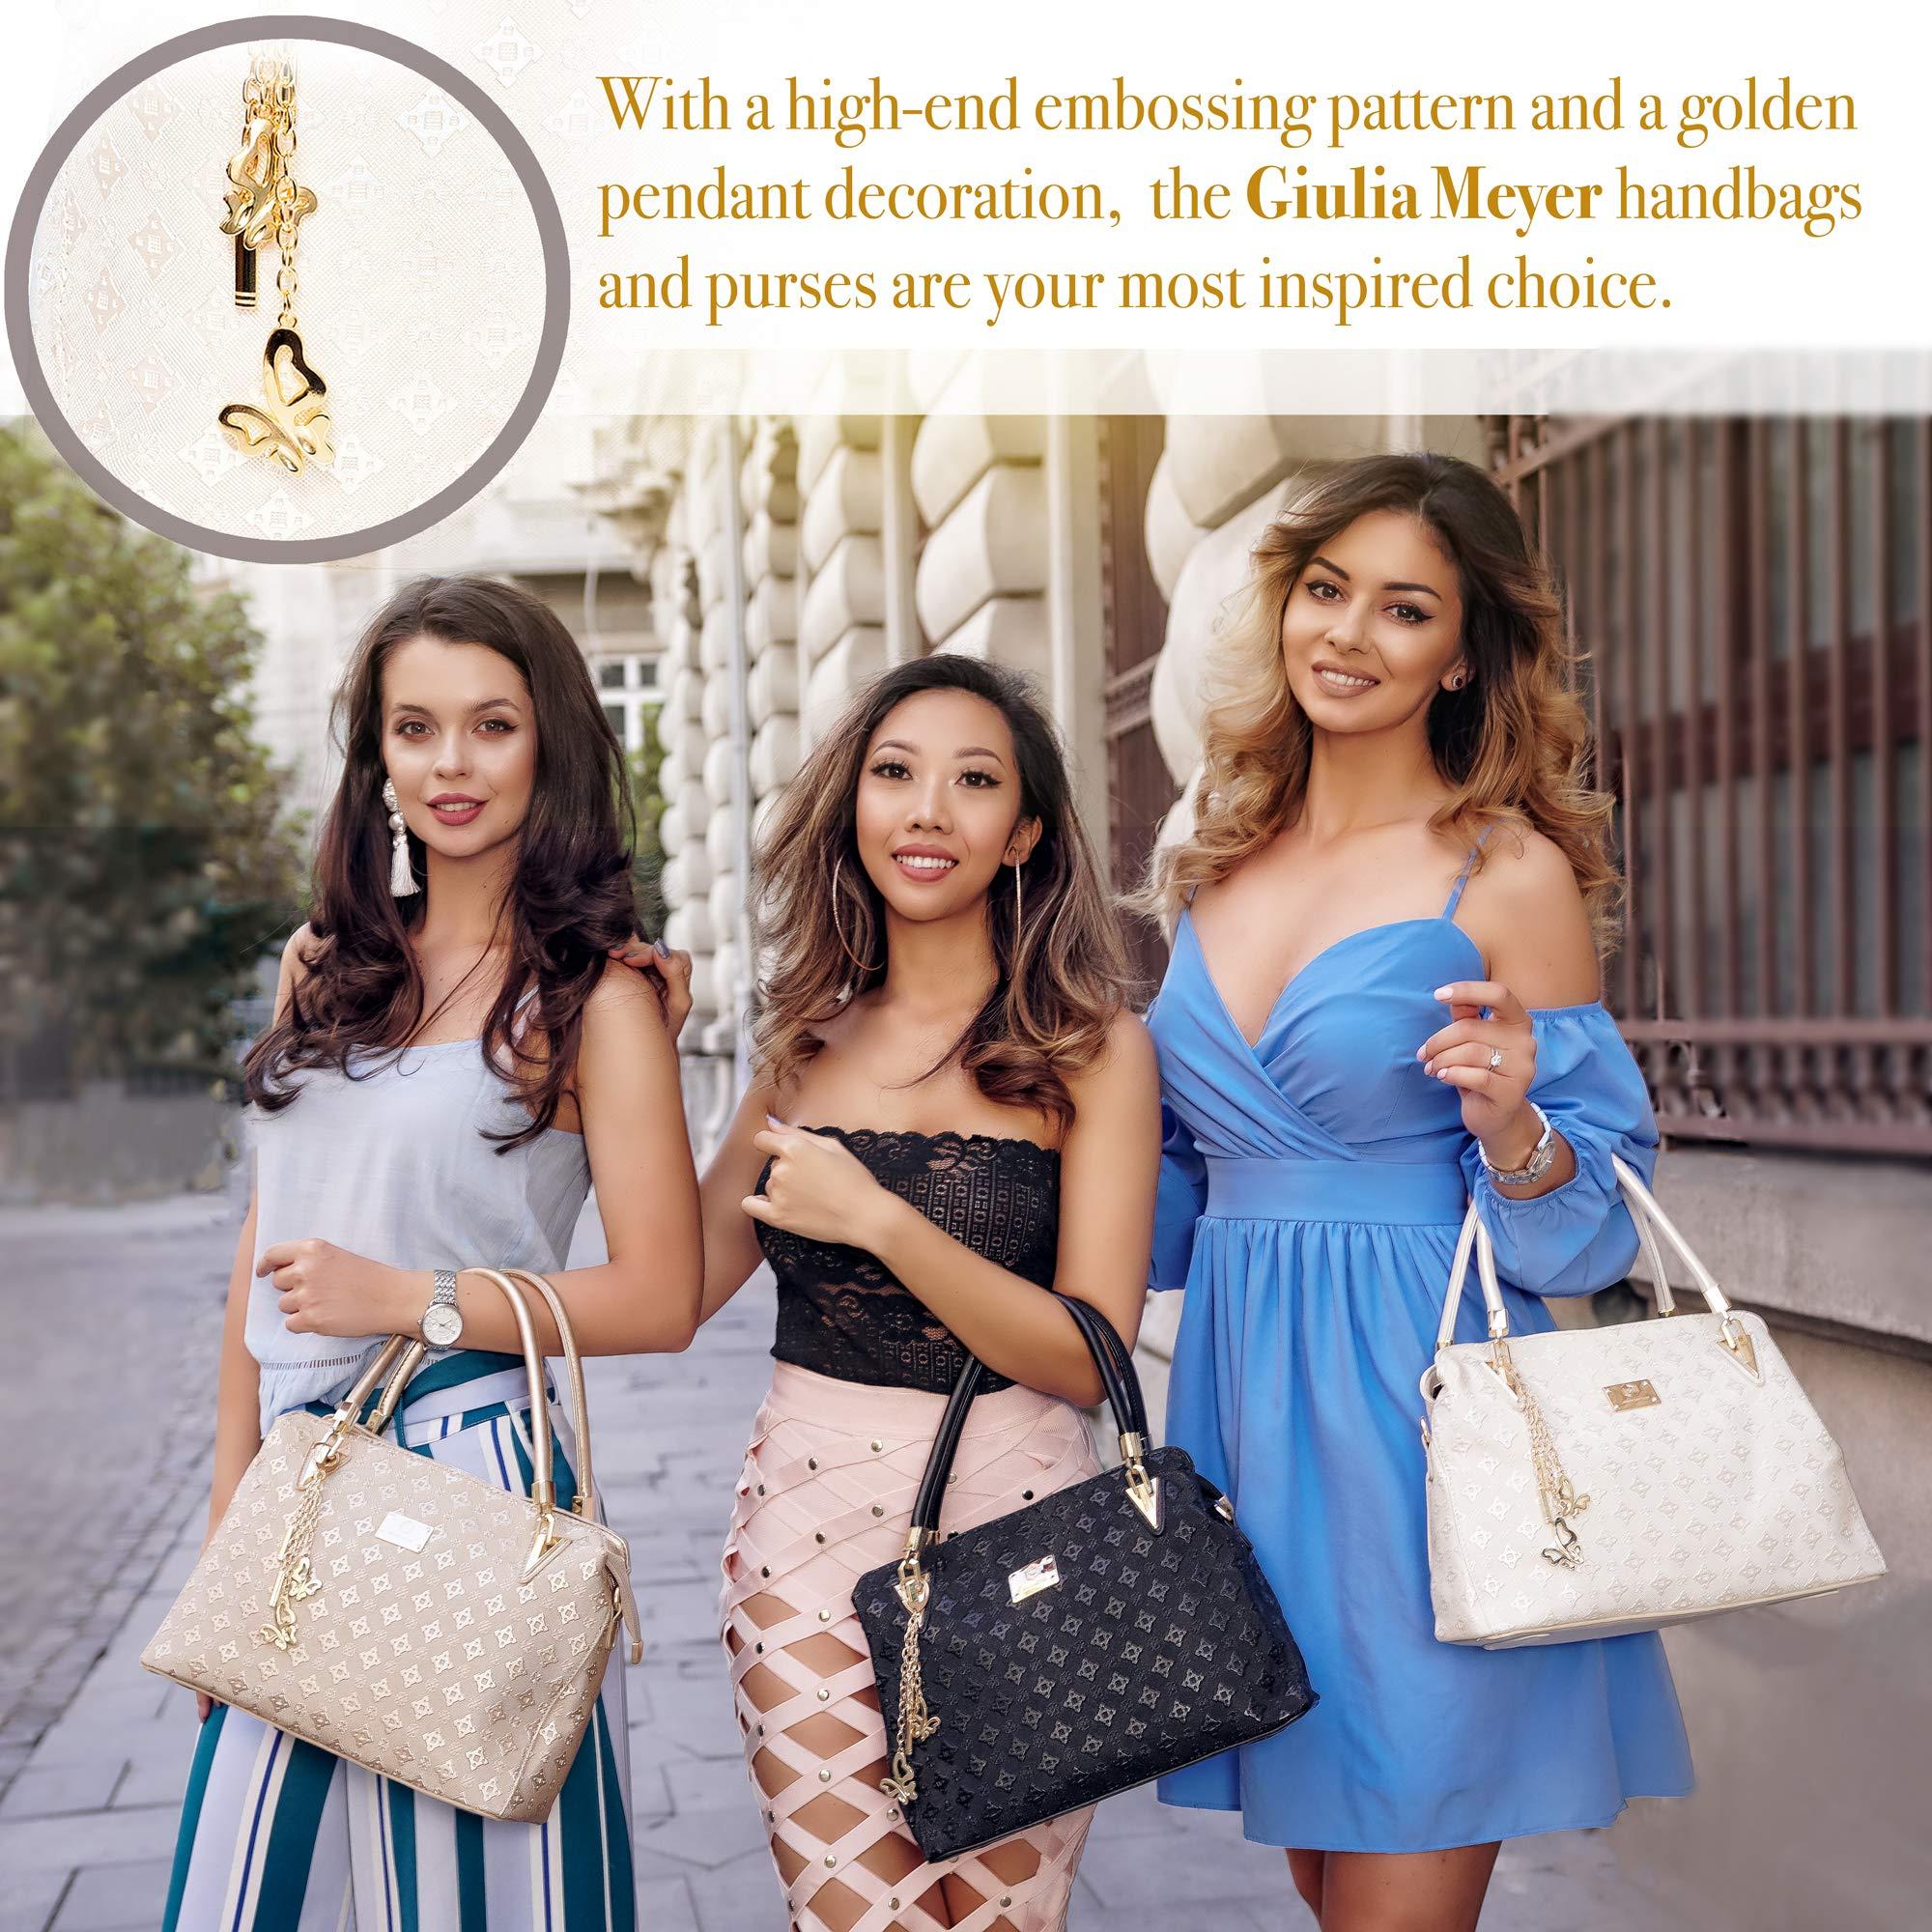 Handbags for Women | Womens Bags Shoulder Bags Ladies Handbags | Purses Clutch Totes Satchel (Black)